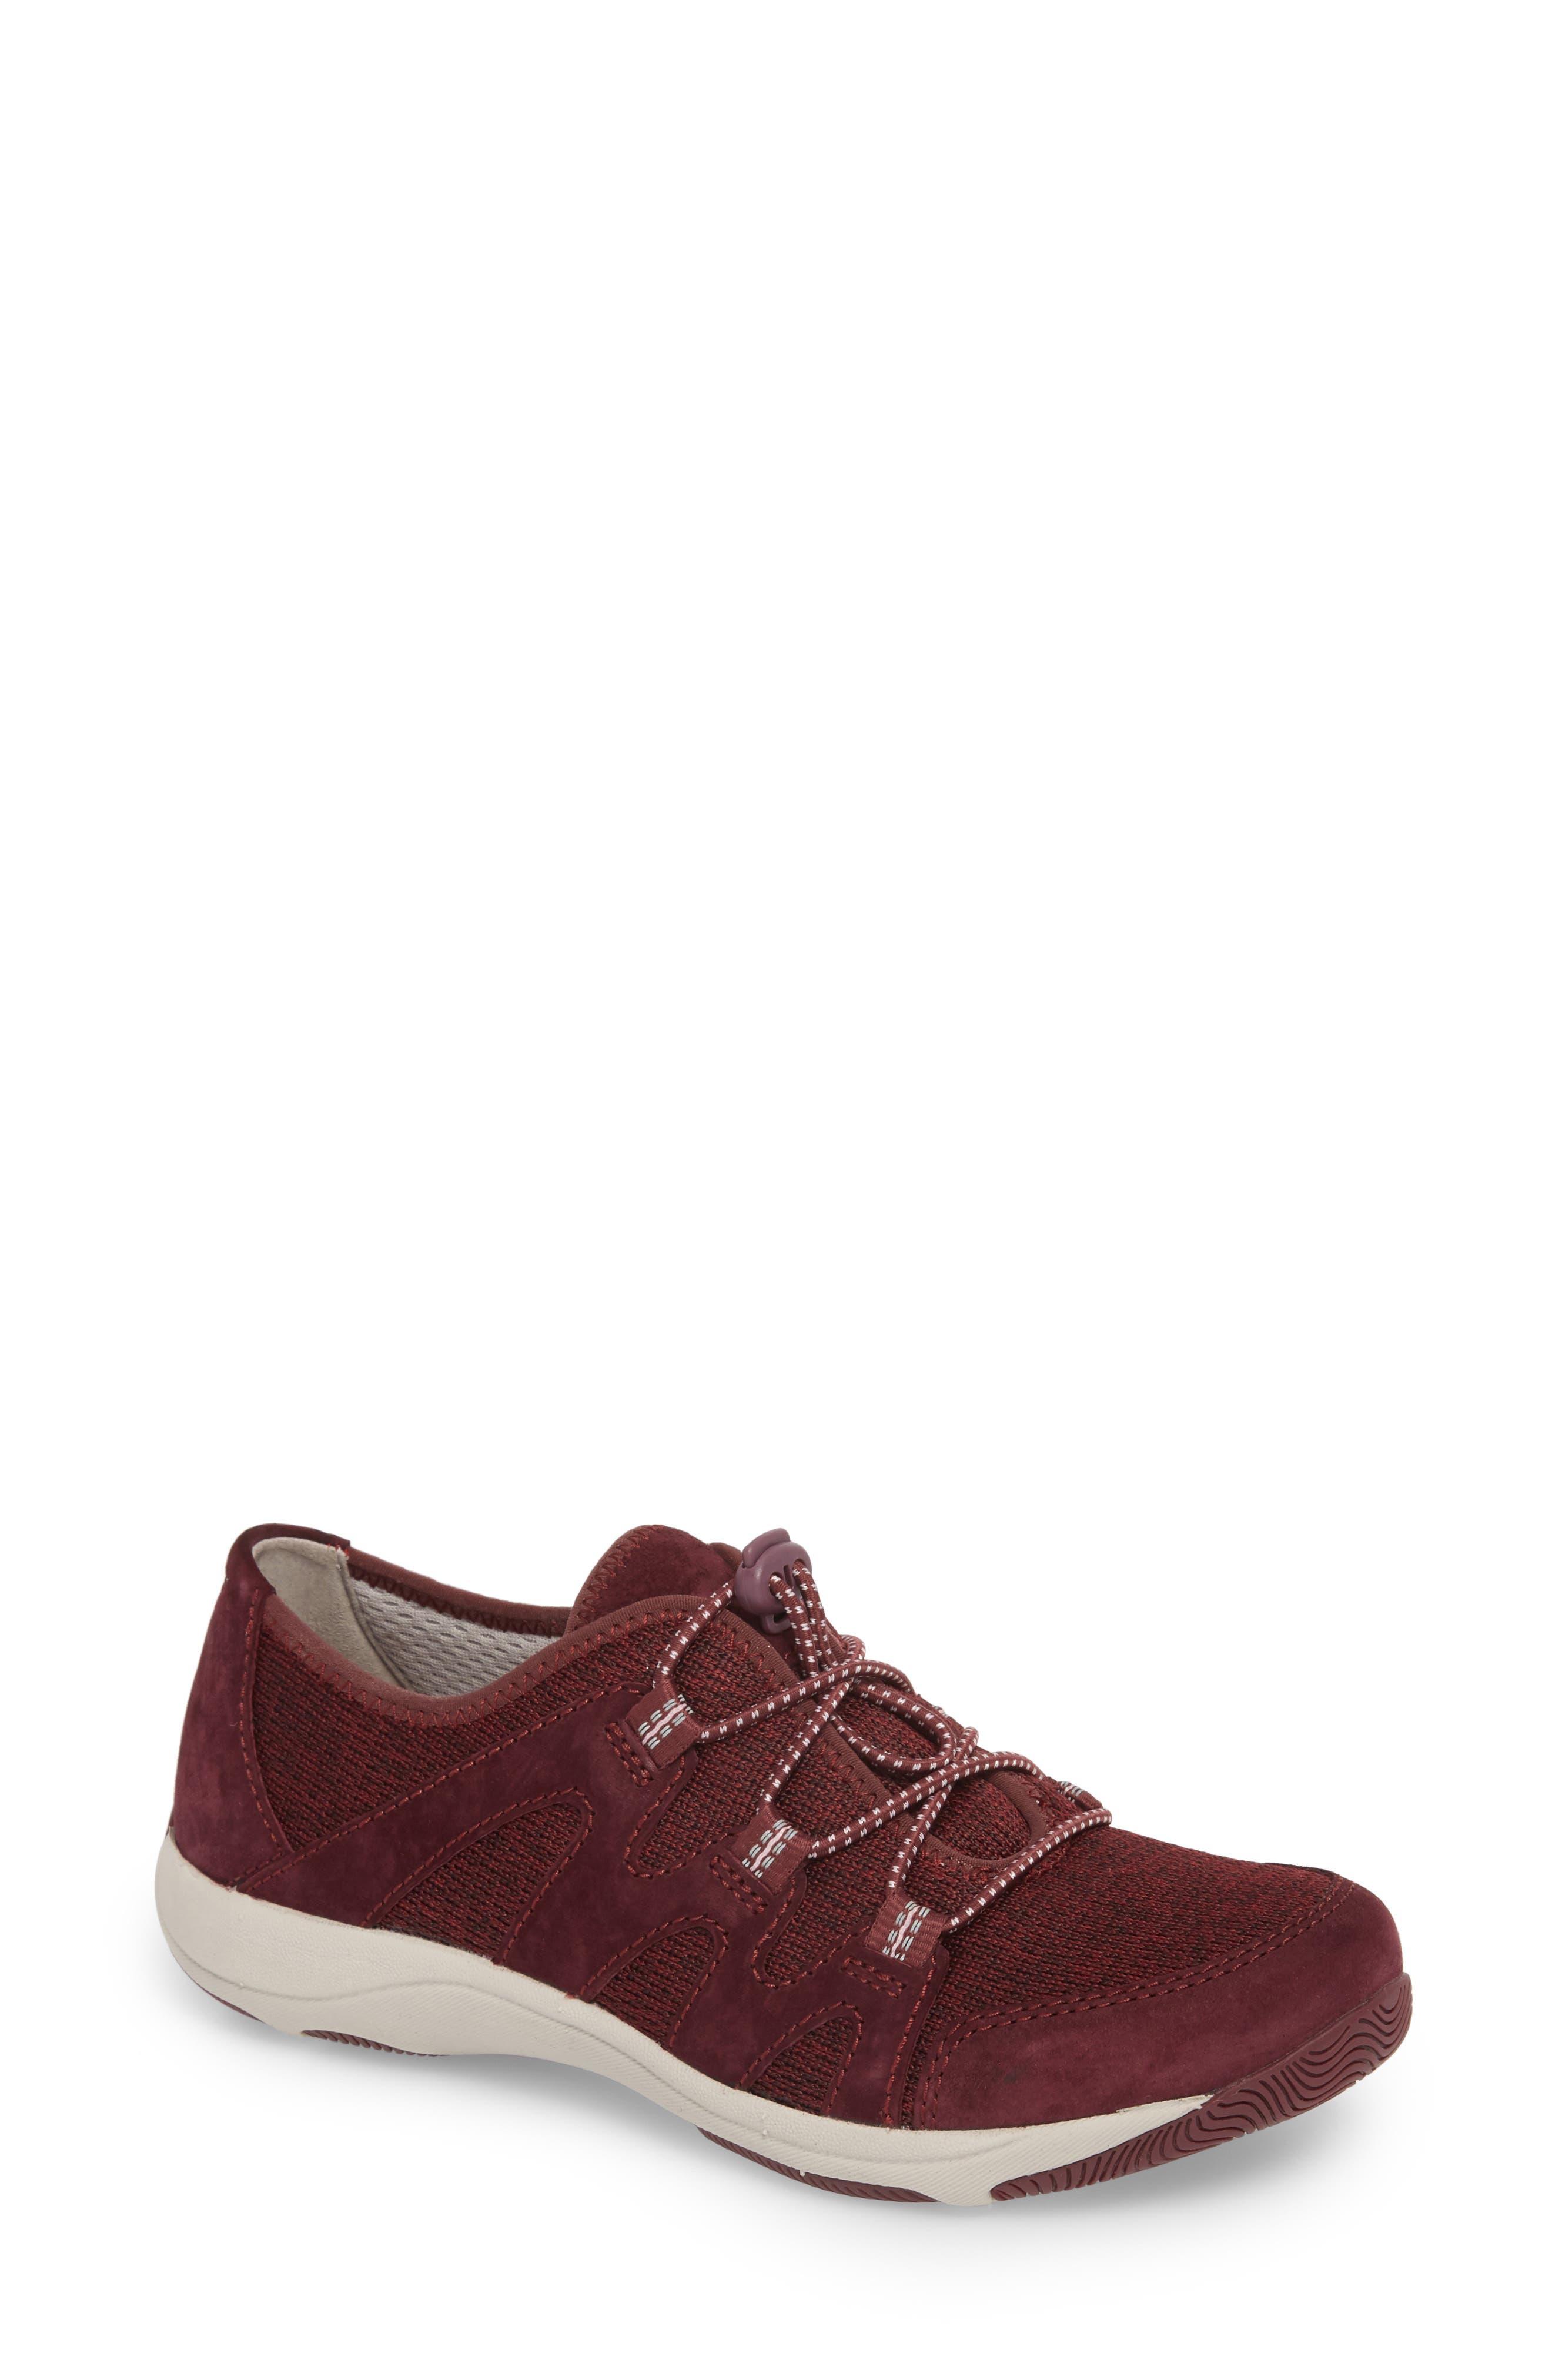 DANSKO Holland Sneaker, Main, color, WINE SUEDE